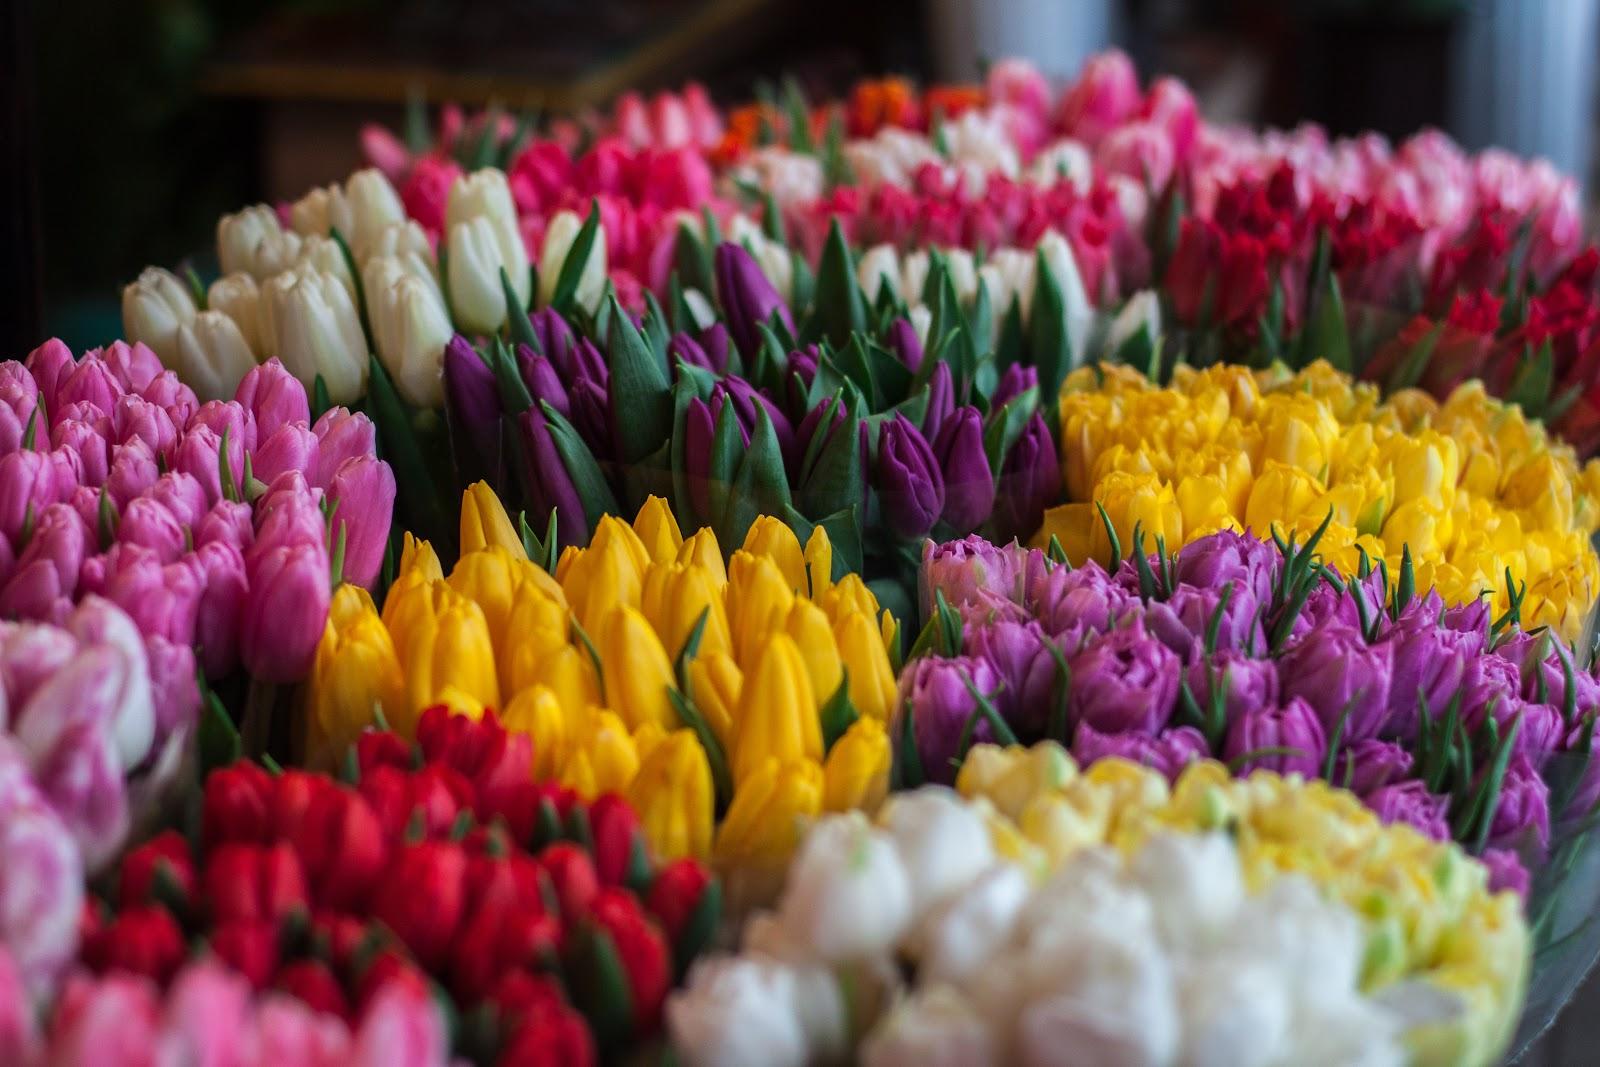 Bright flowers rule summer